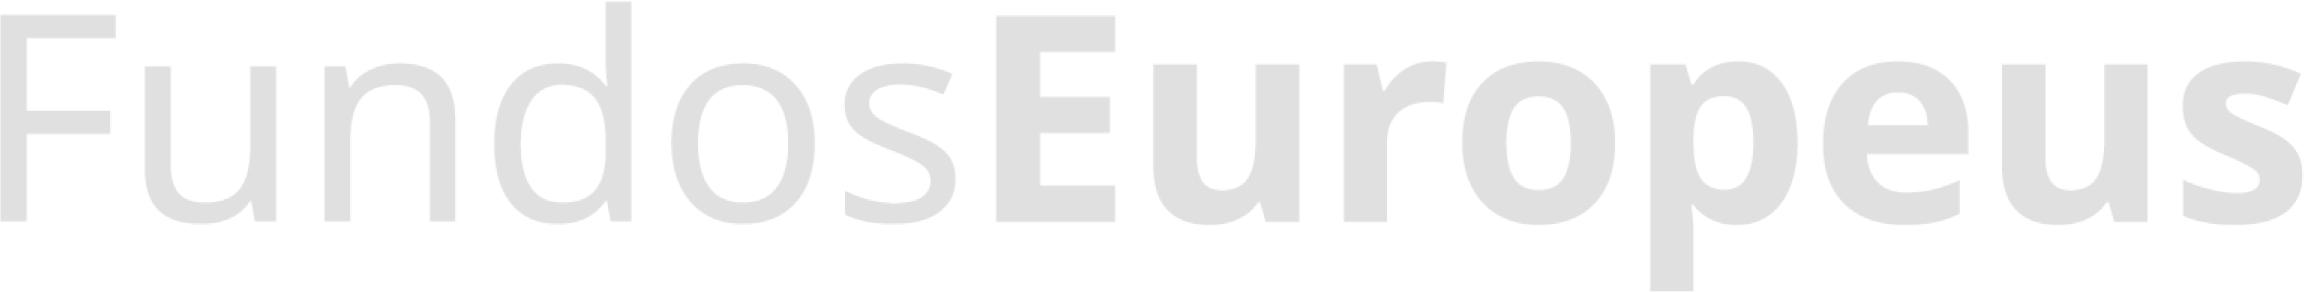 FundosEuropeus.pt